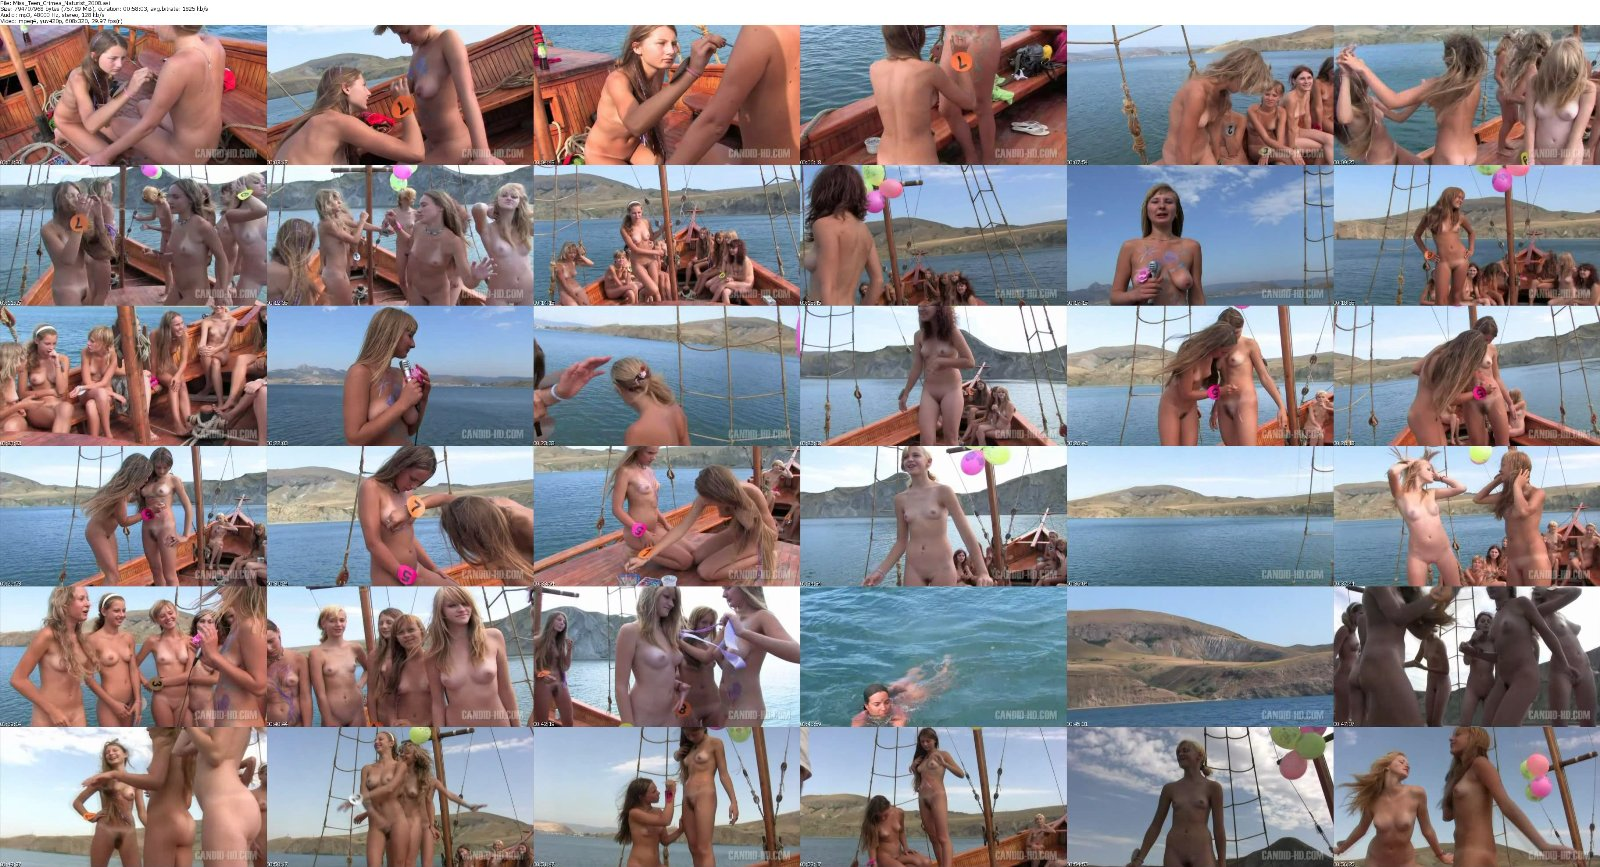 Vidios gorgoyles and nudity erotic images